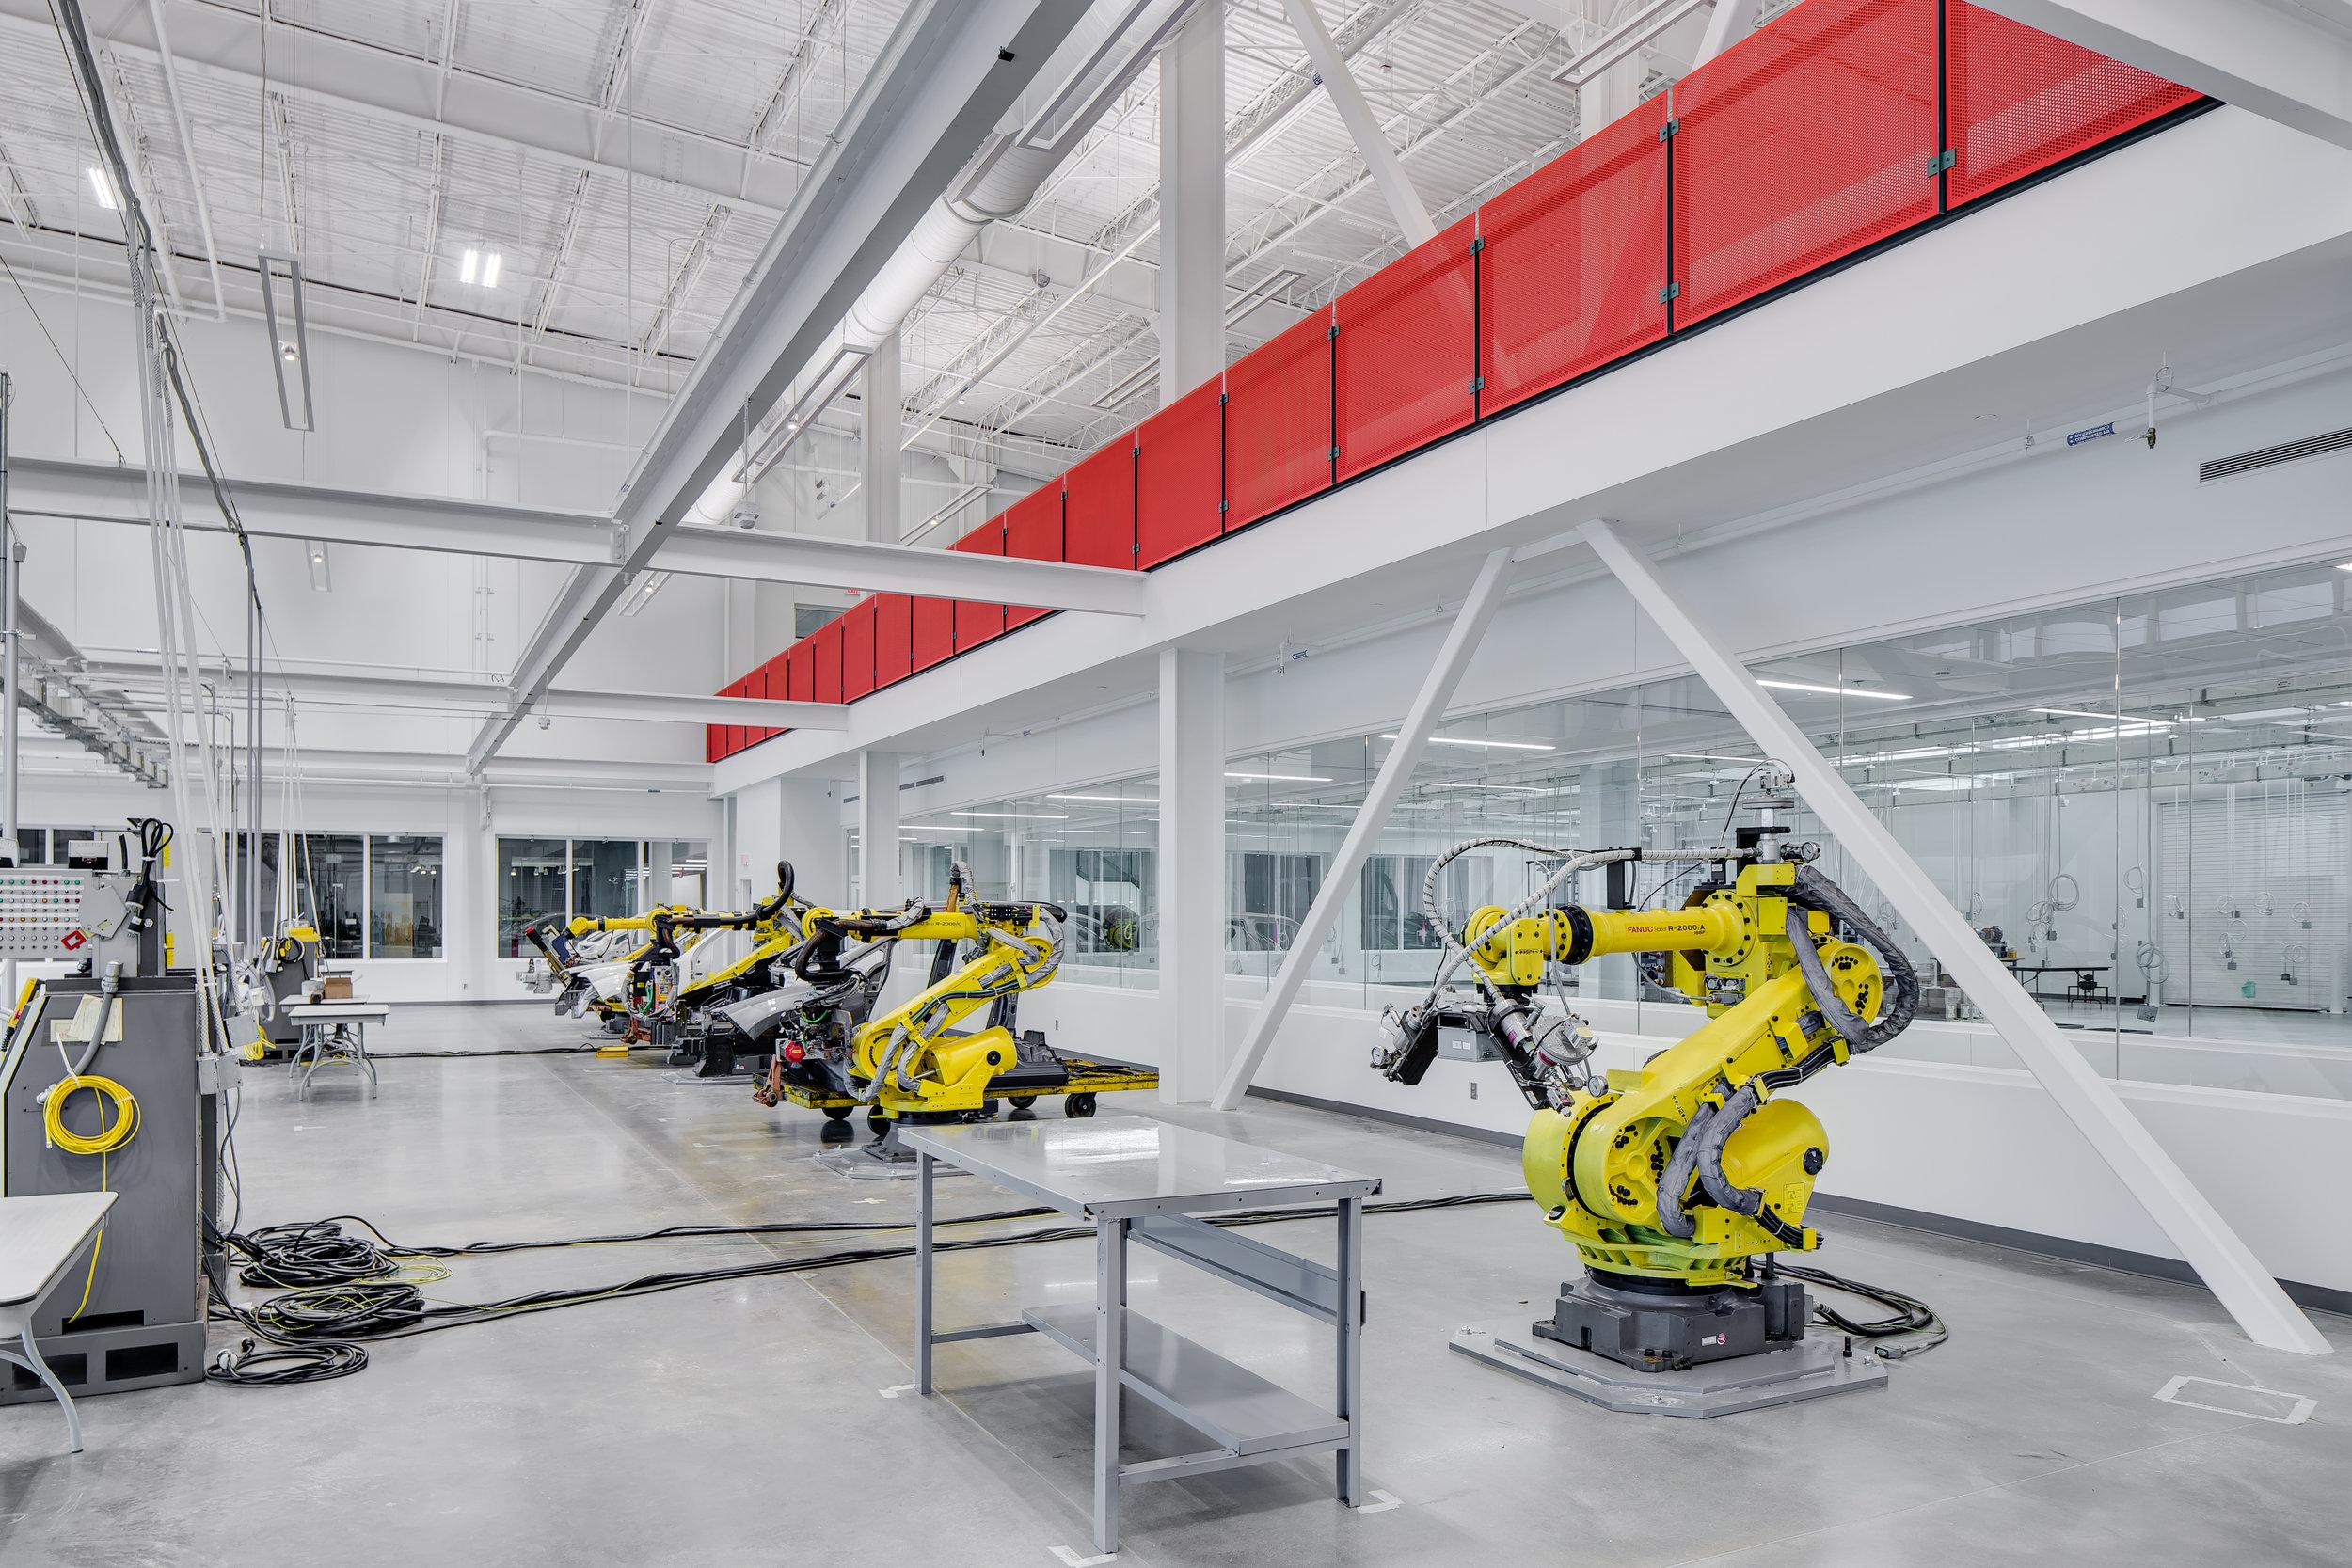 TCAT/Nissan Training Center - 12